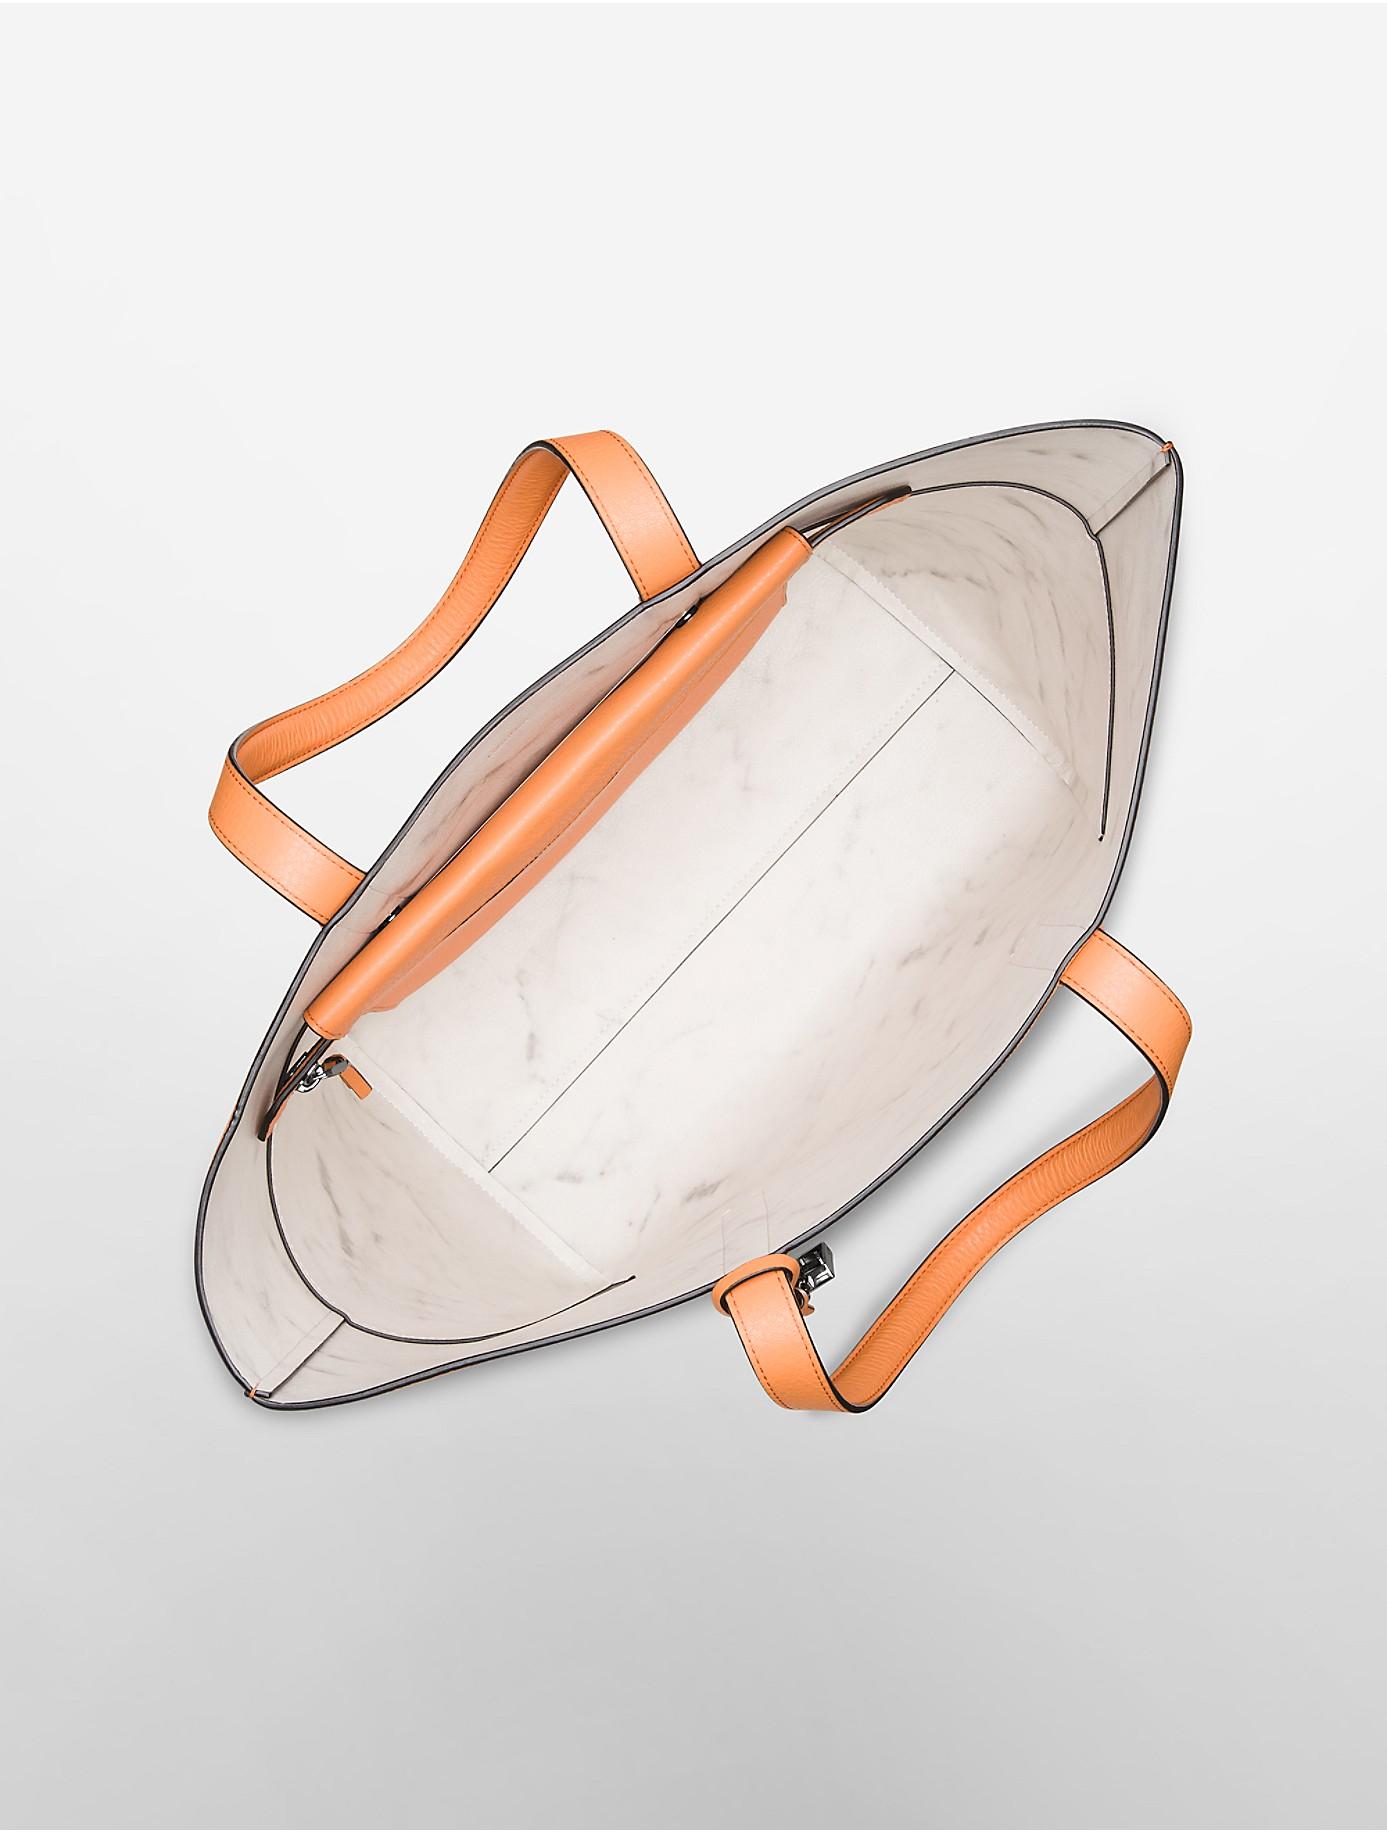 calvin klein arslyne leather shopper tote in orange lyst. Black Bedroom Furniture Sets. Home Design Ideas